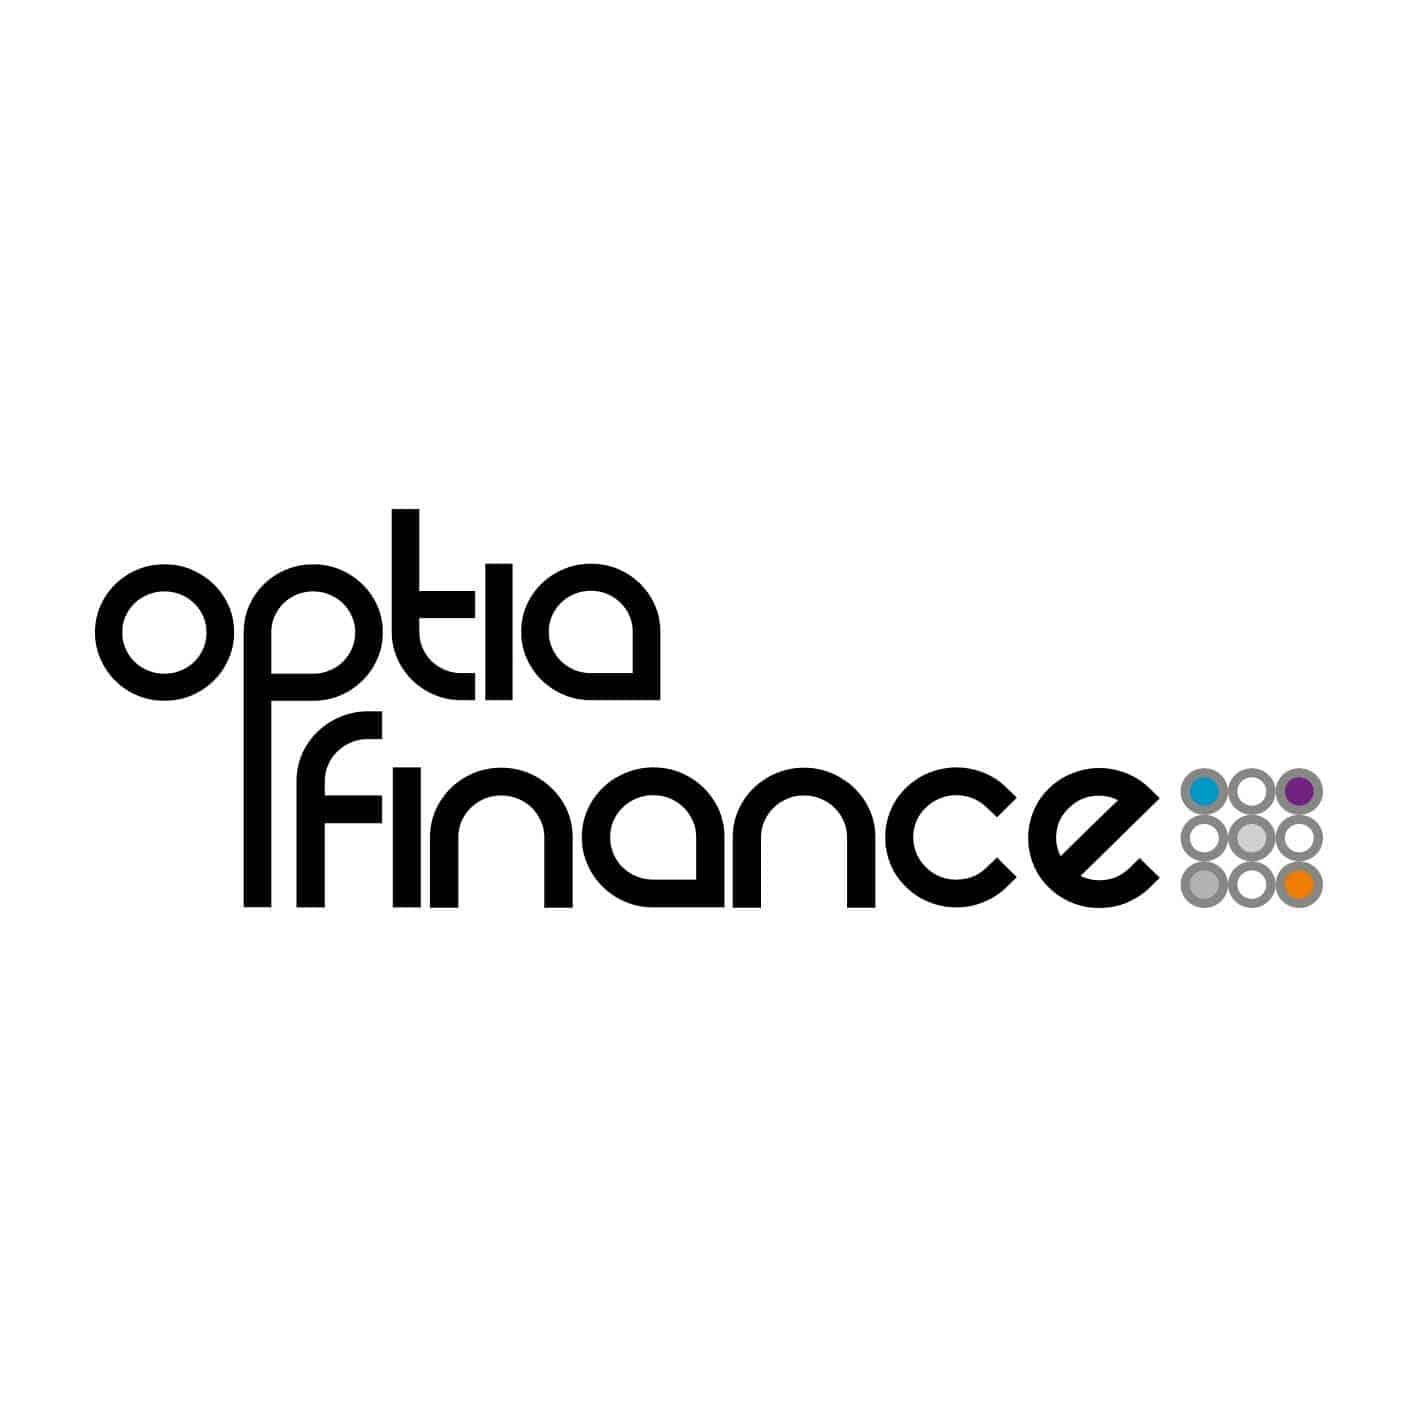 optia-finance-logo-1964-communication